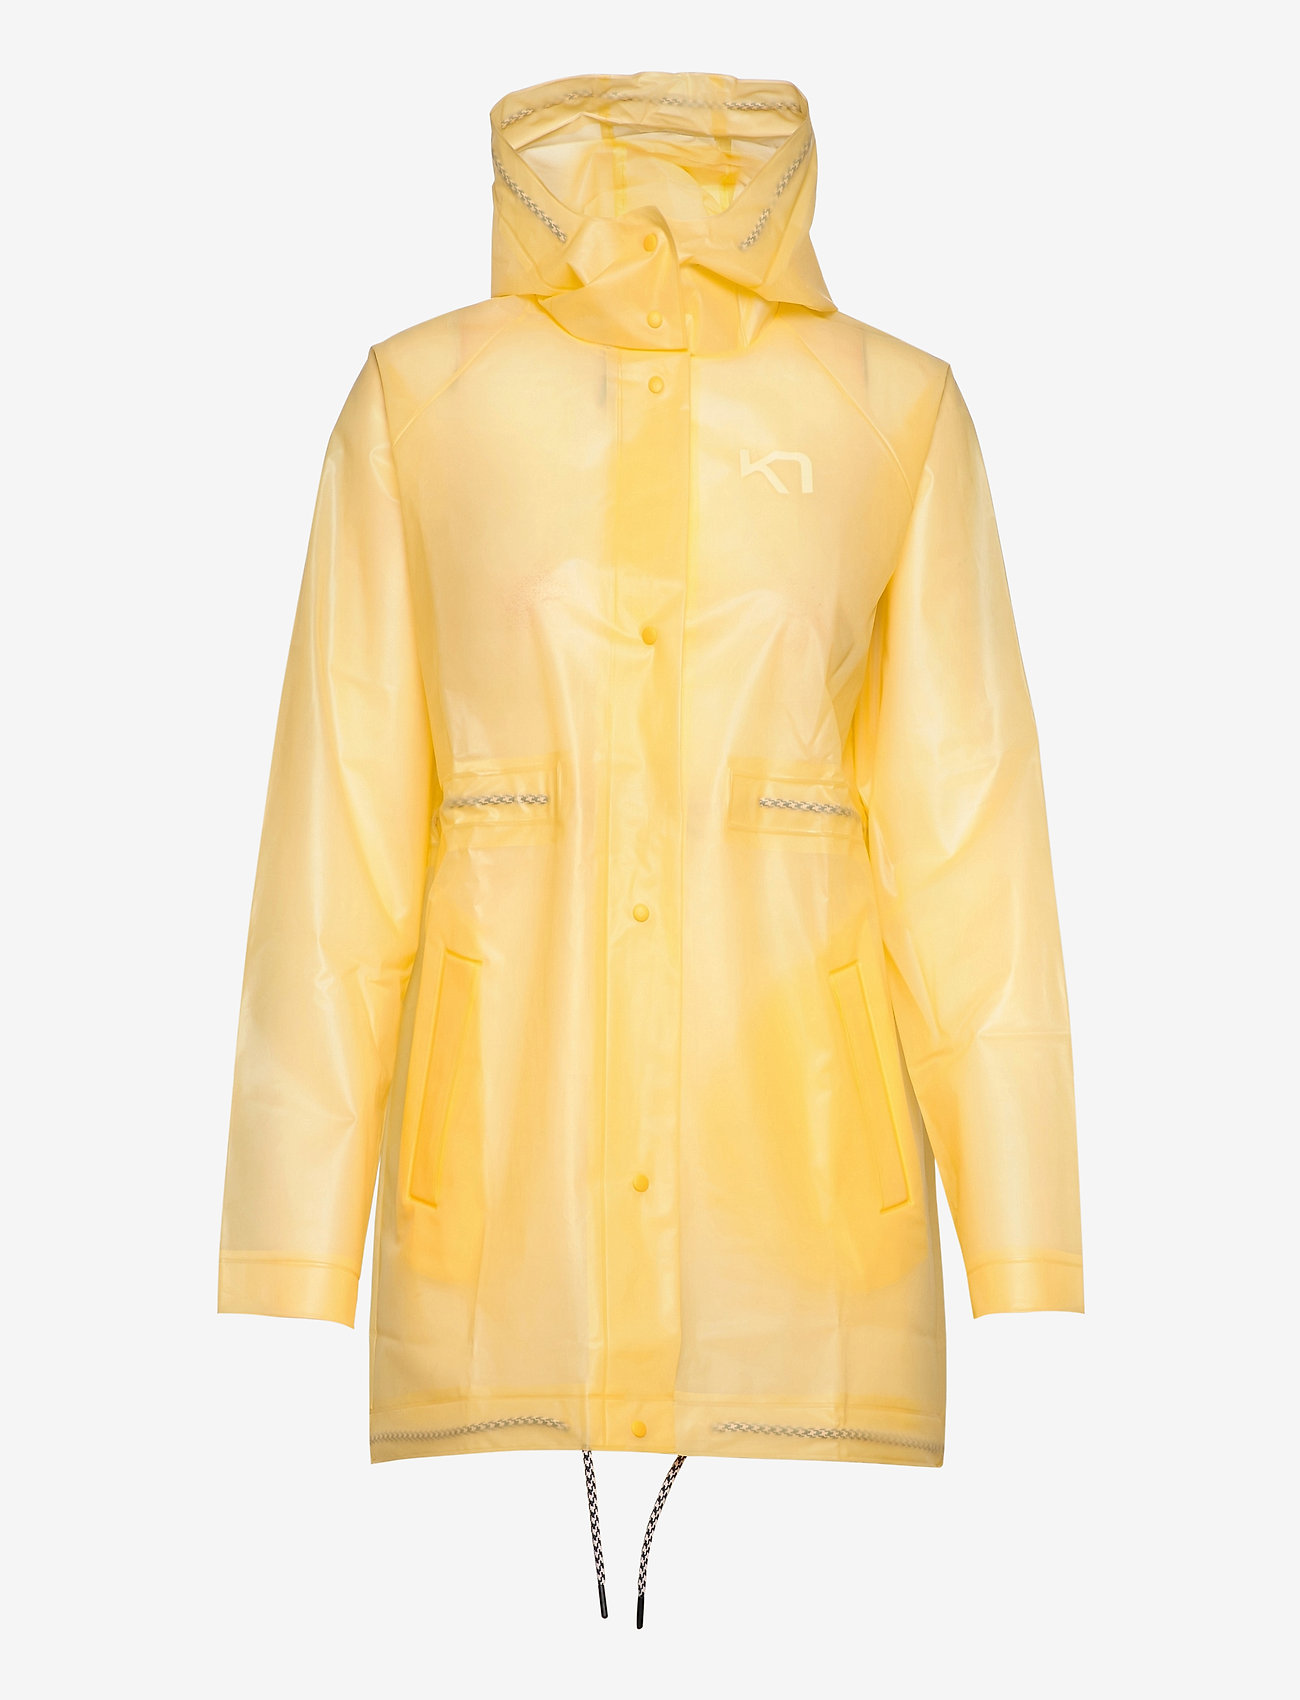 Kari Traa - BULKEN JACKET - manteaux de pluie - shine - 1